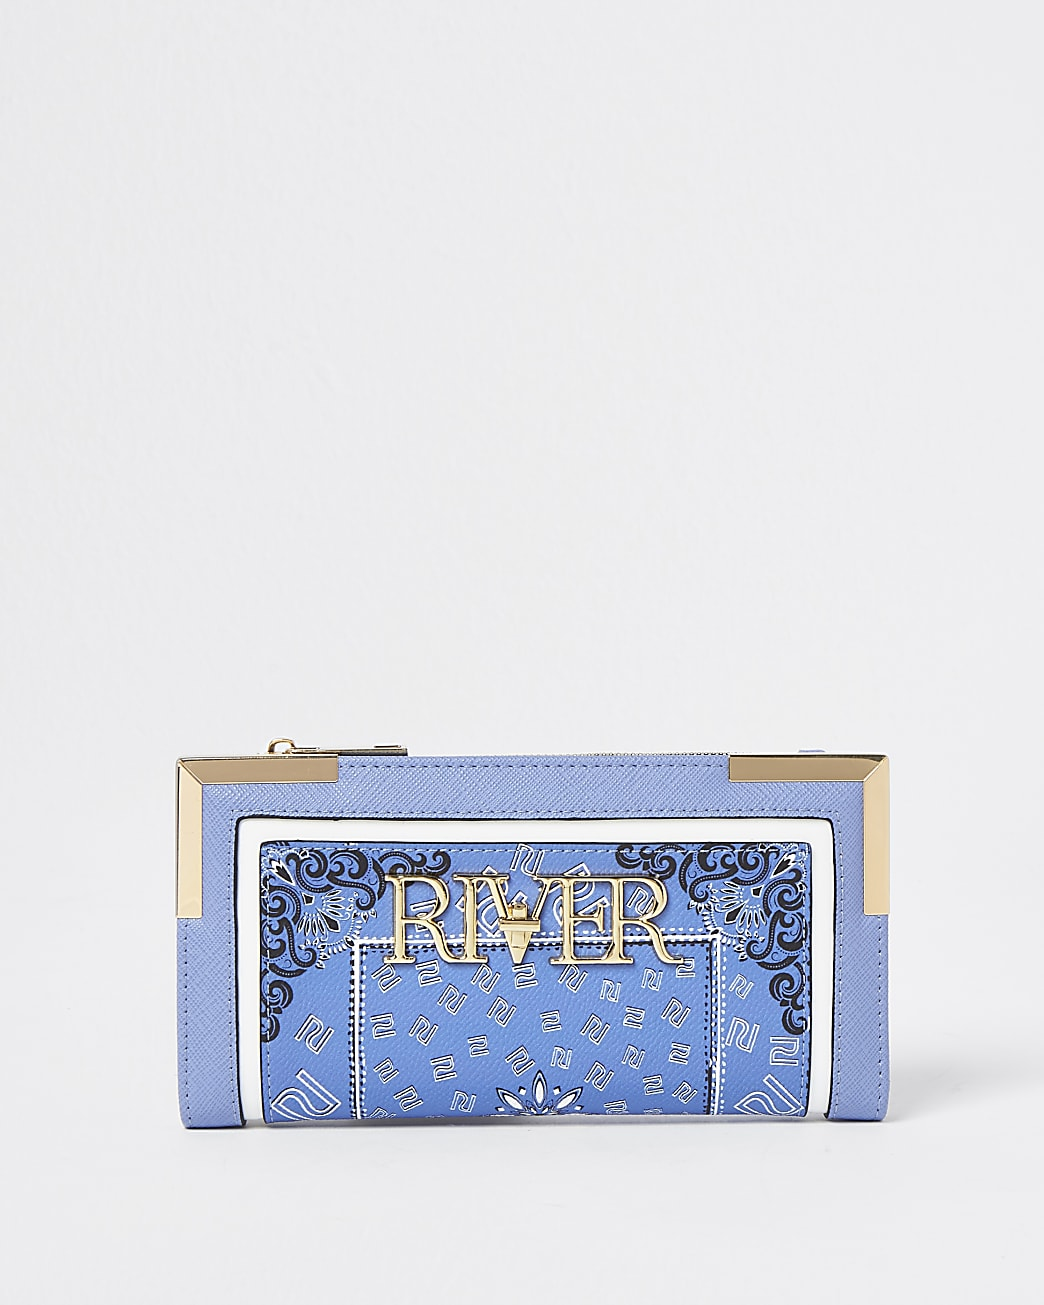 Blue bandana scarf print purse